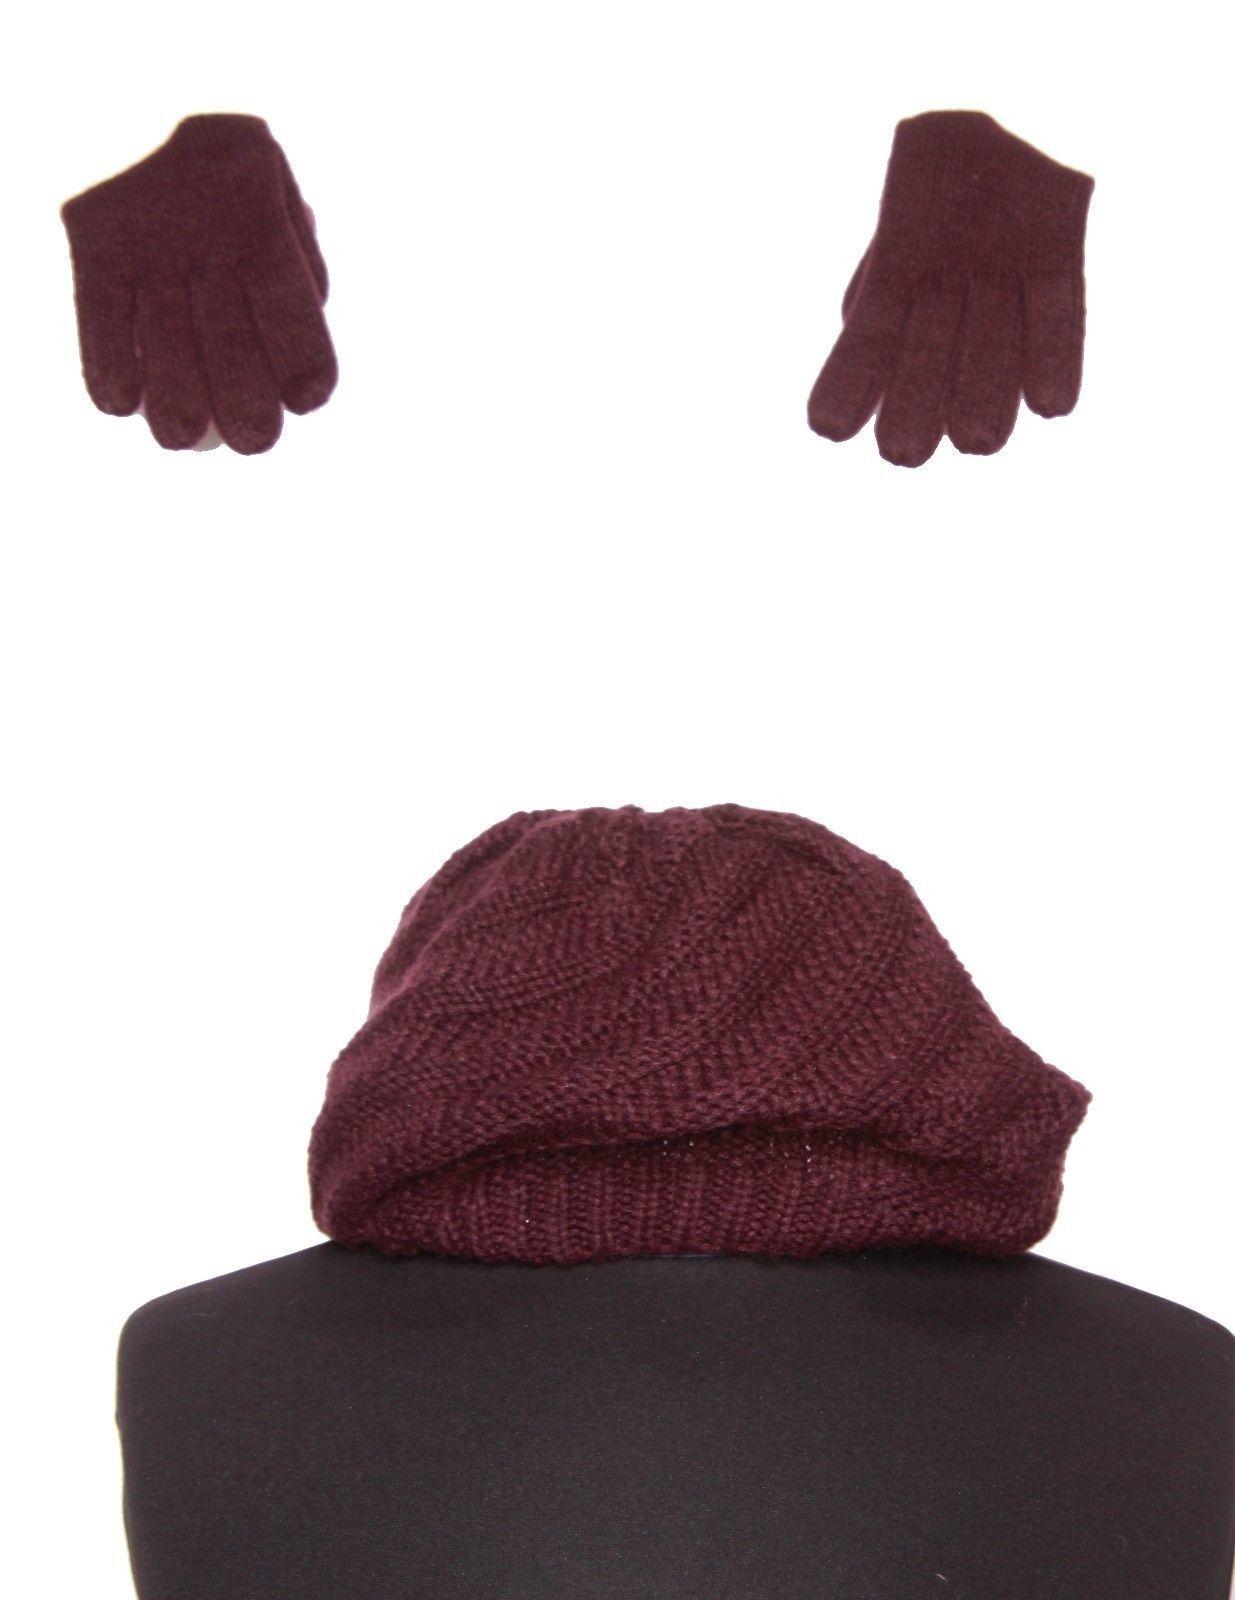 Set Of Hat&Gloves In Plum/Burgundy Colour Winter Warmers Fashion Essentials(S65)